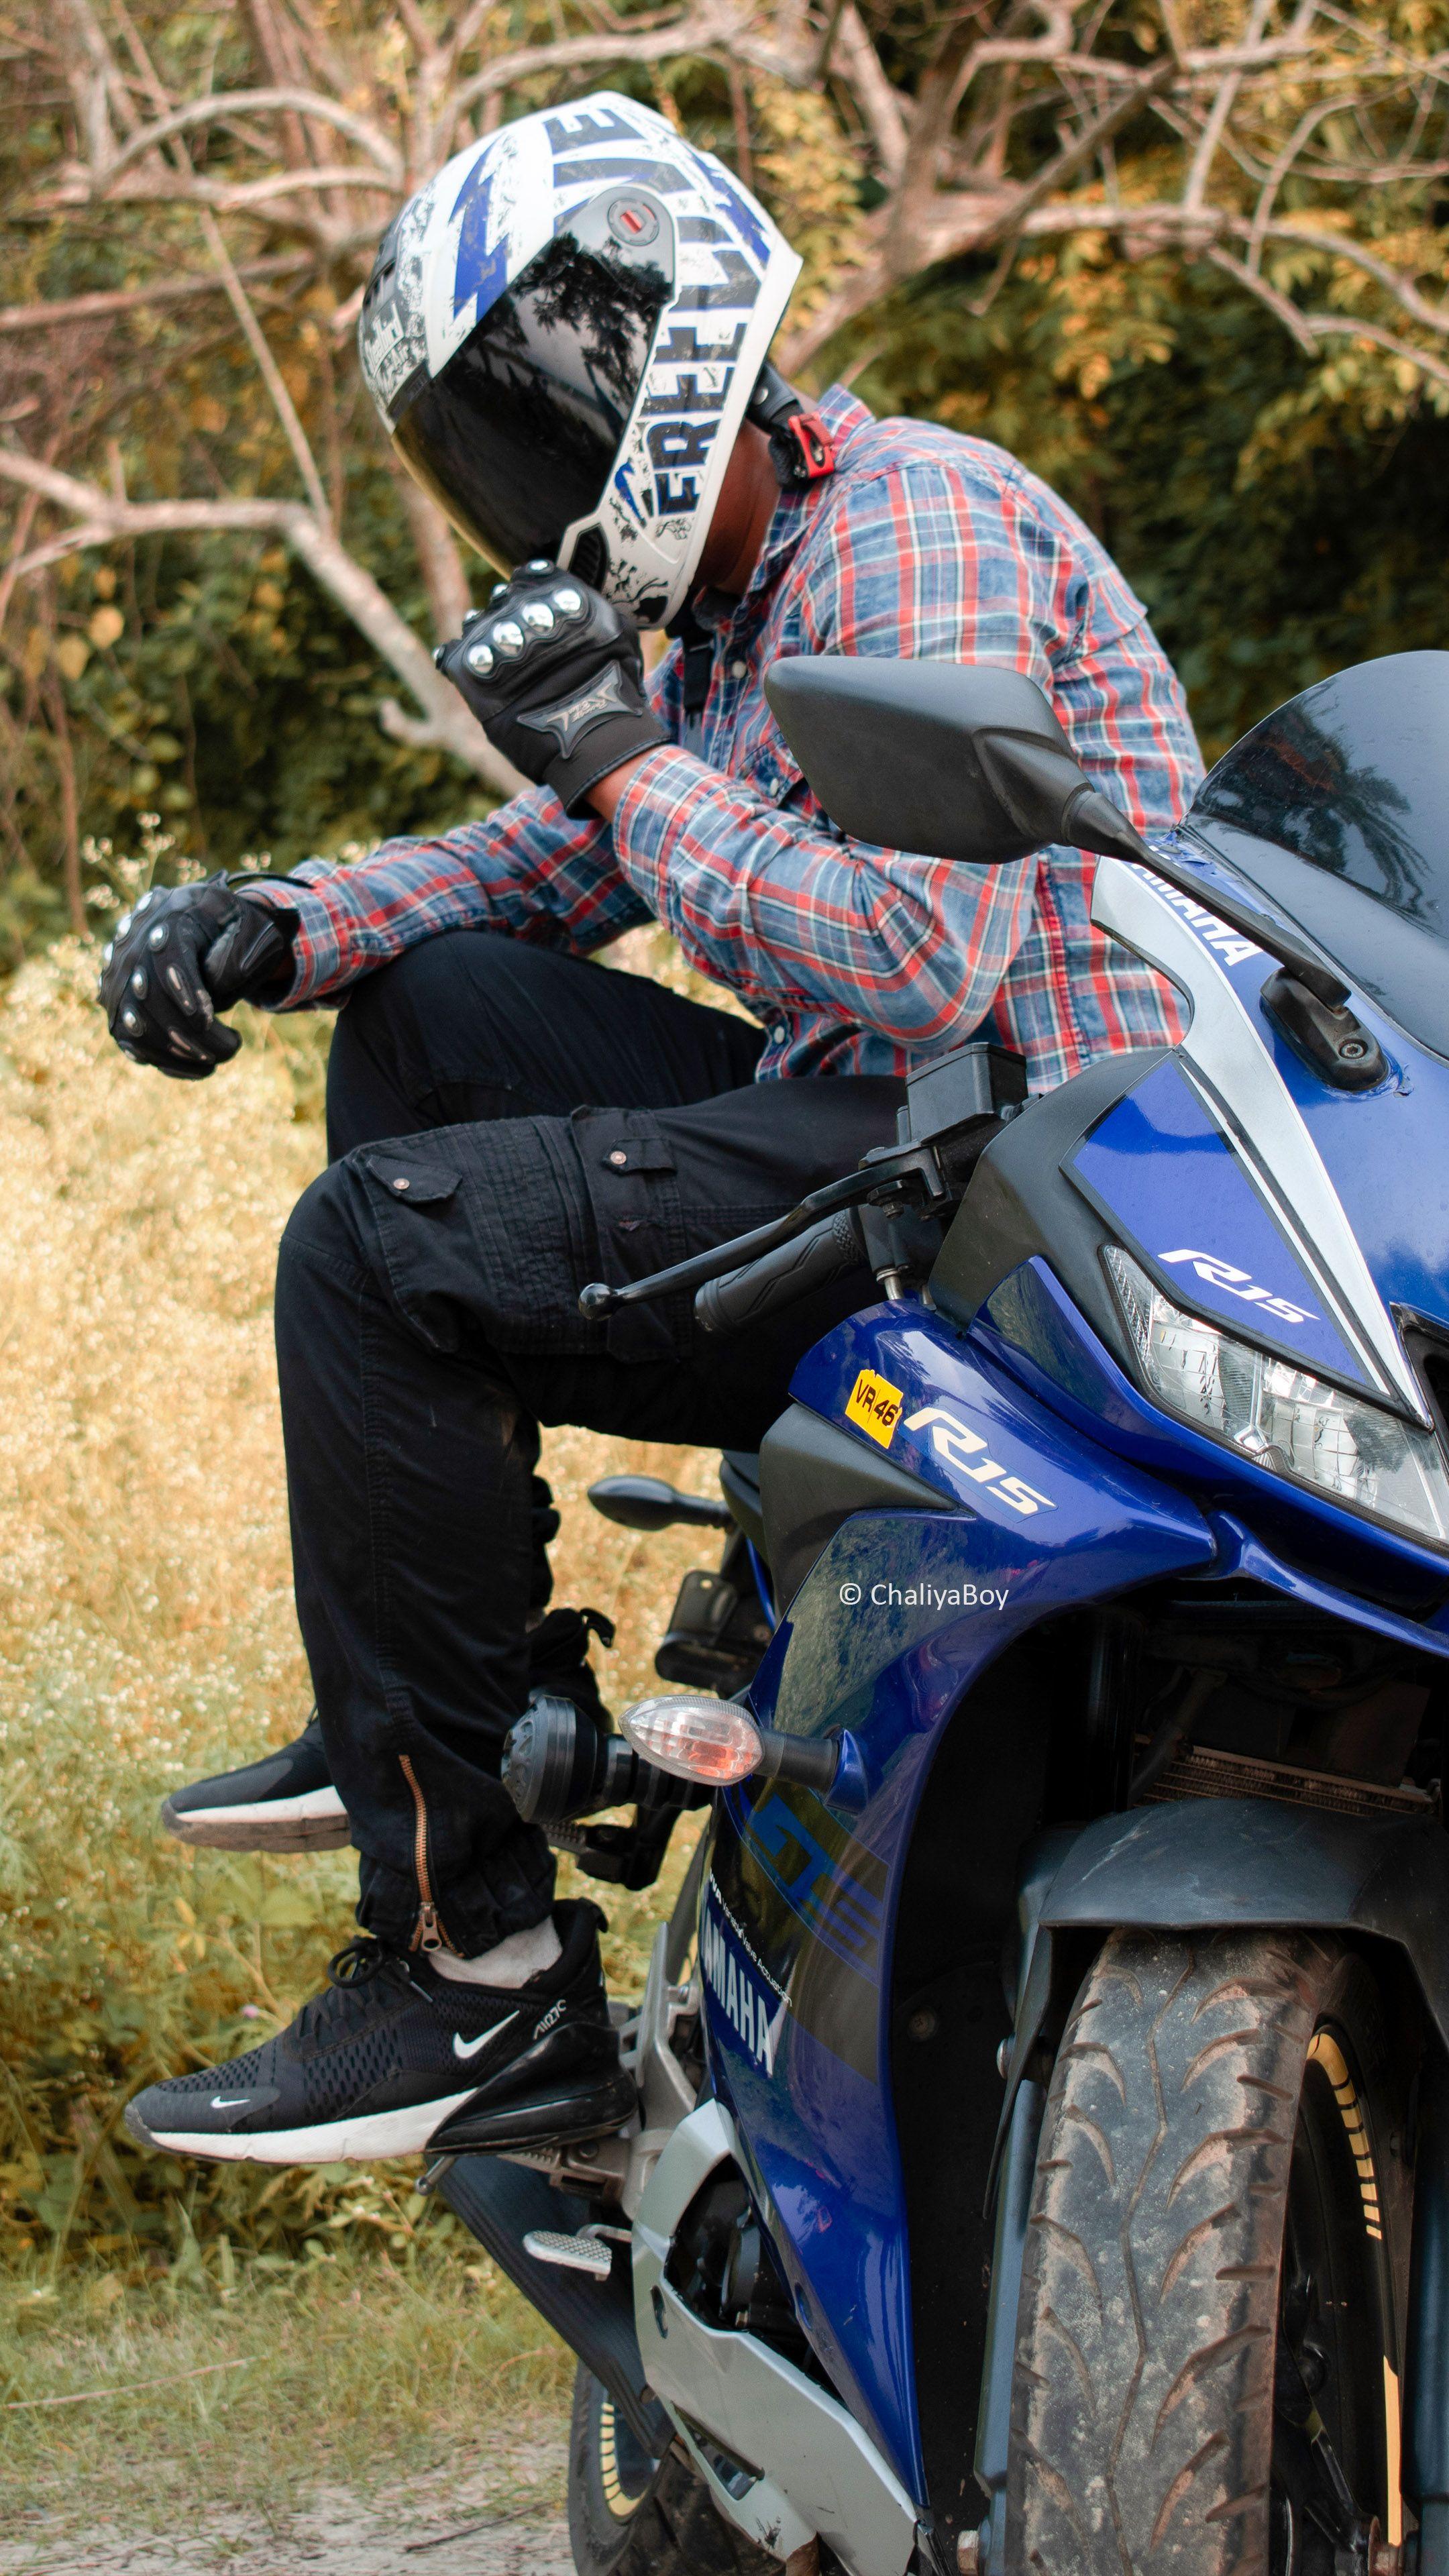 Rider Franky R15 Bike Helmet 4K Ultra ...